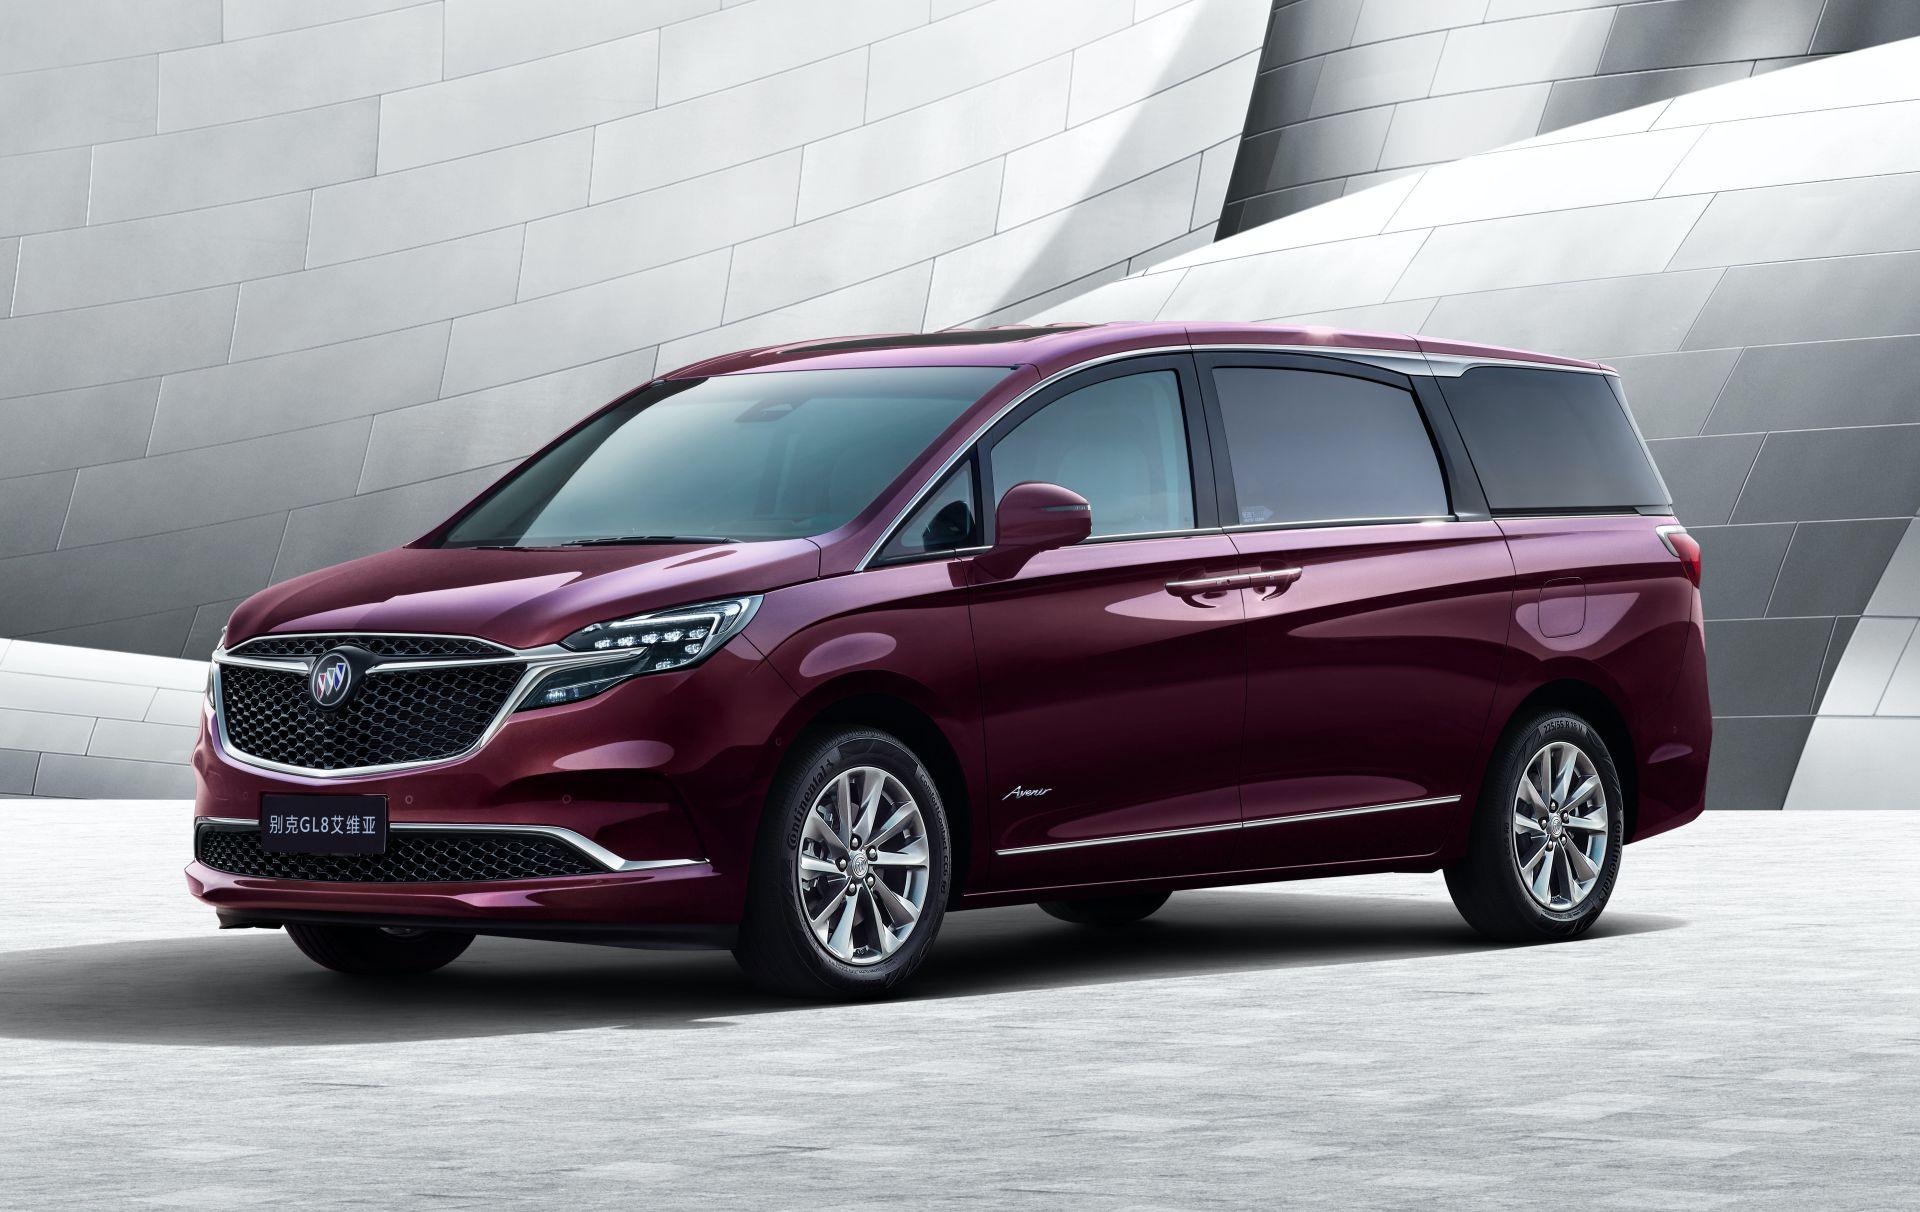 2020-Buick-GL8-Avenir-China-spec-10